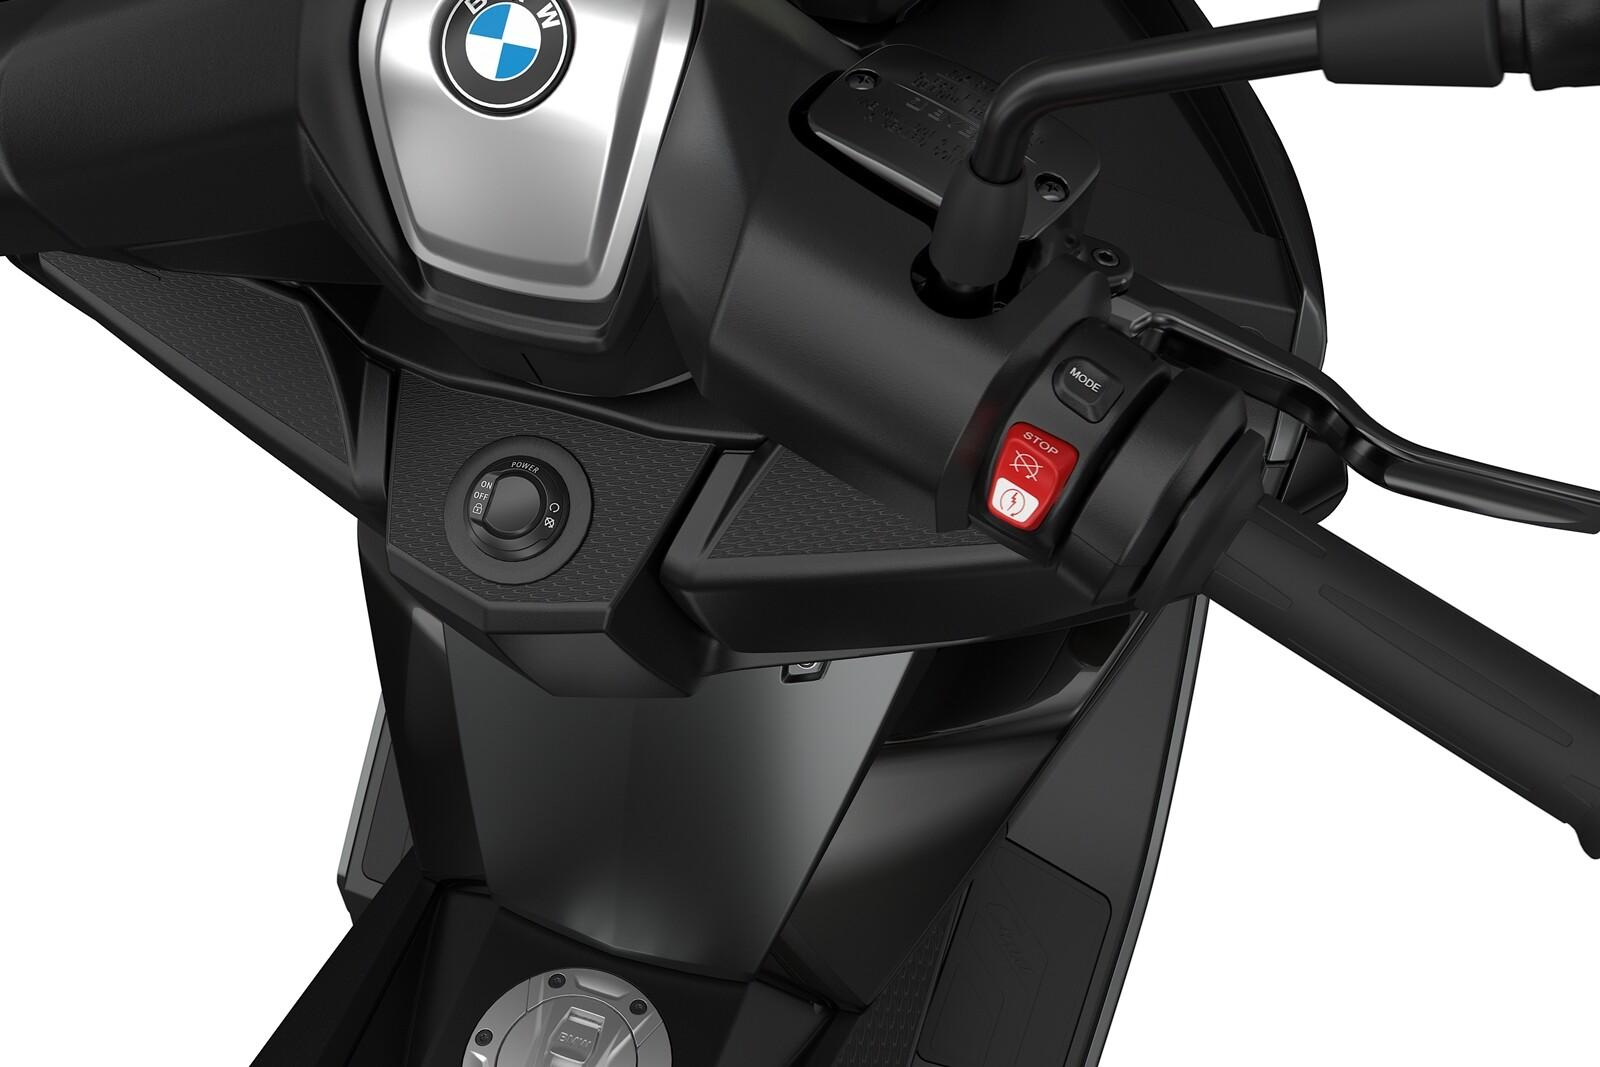 Foto de BMW C 400 X y C 400 GT 2021 (1/44)